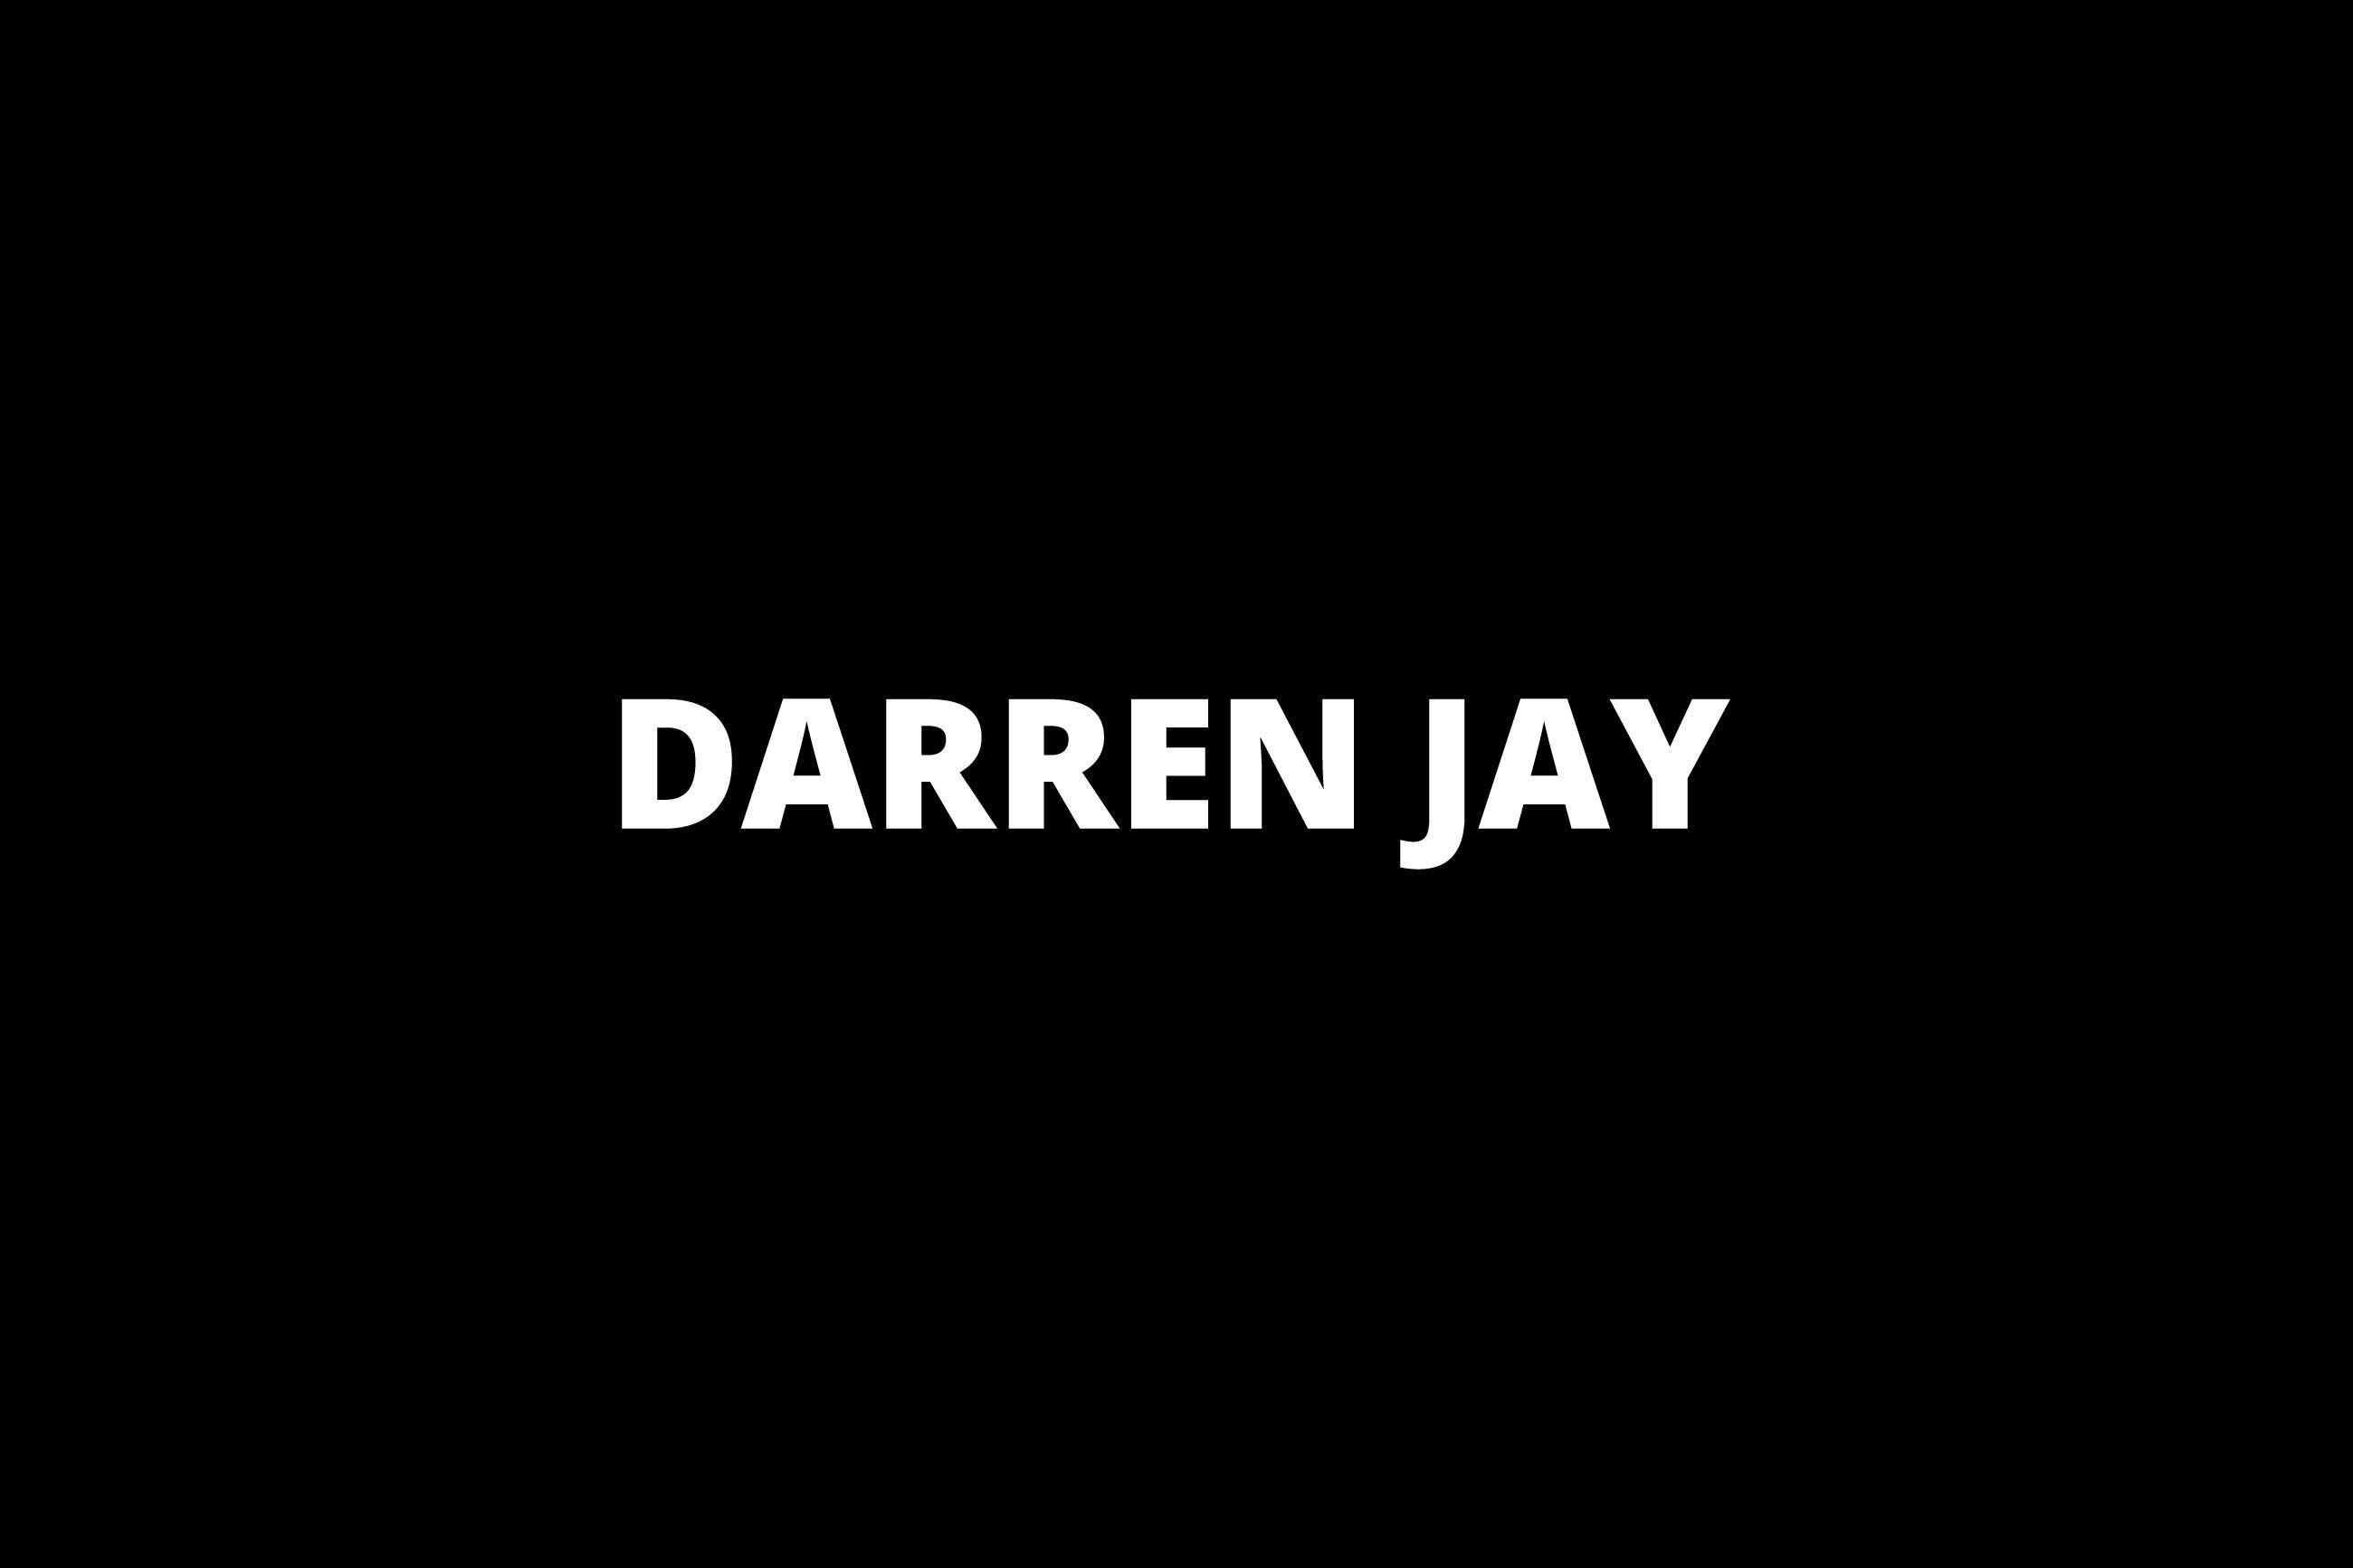 Darren Jay (31/01/2017)